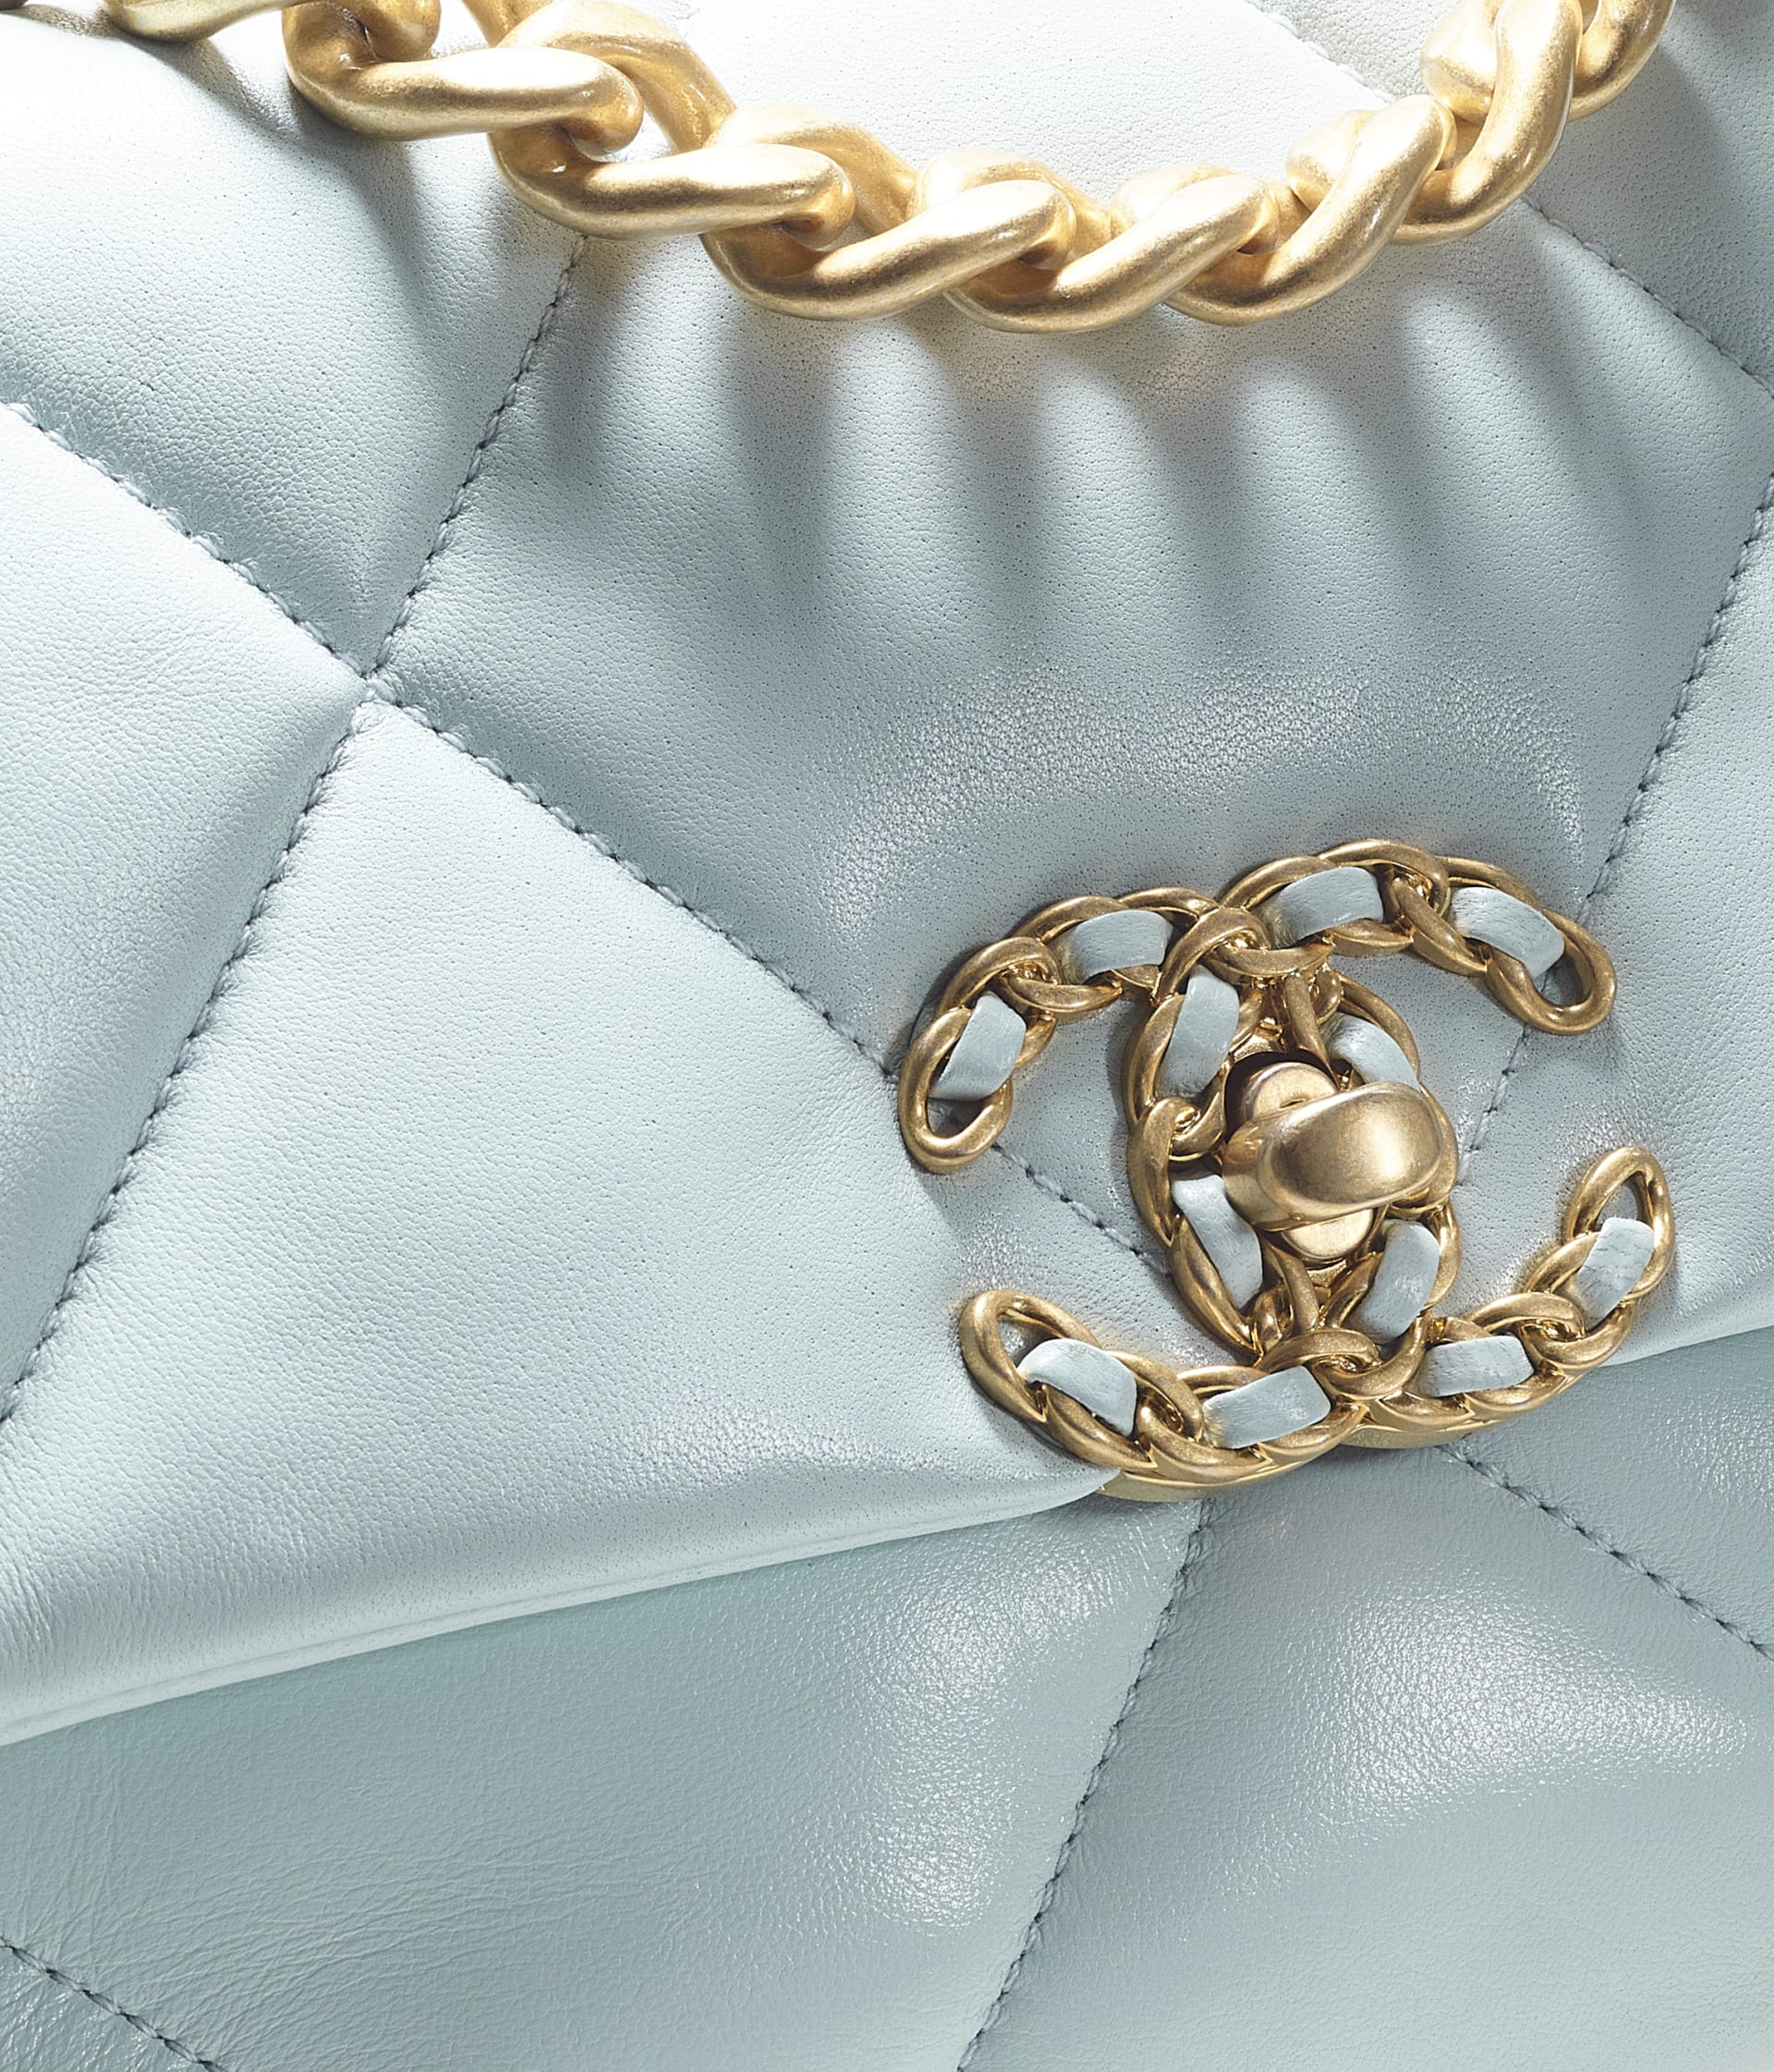 image 4 - CHANEL 19 Handbag - Lambskin, Gold-Tone, Silver-Tone & Ruthenium-Finish Metal - Light Blue